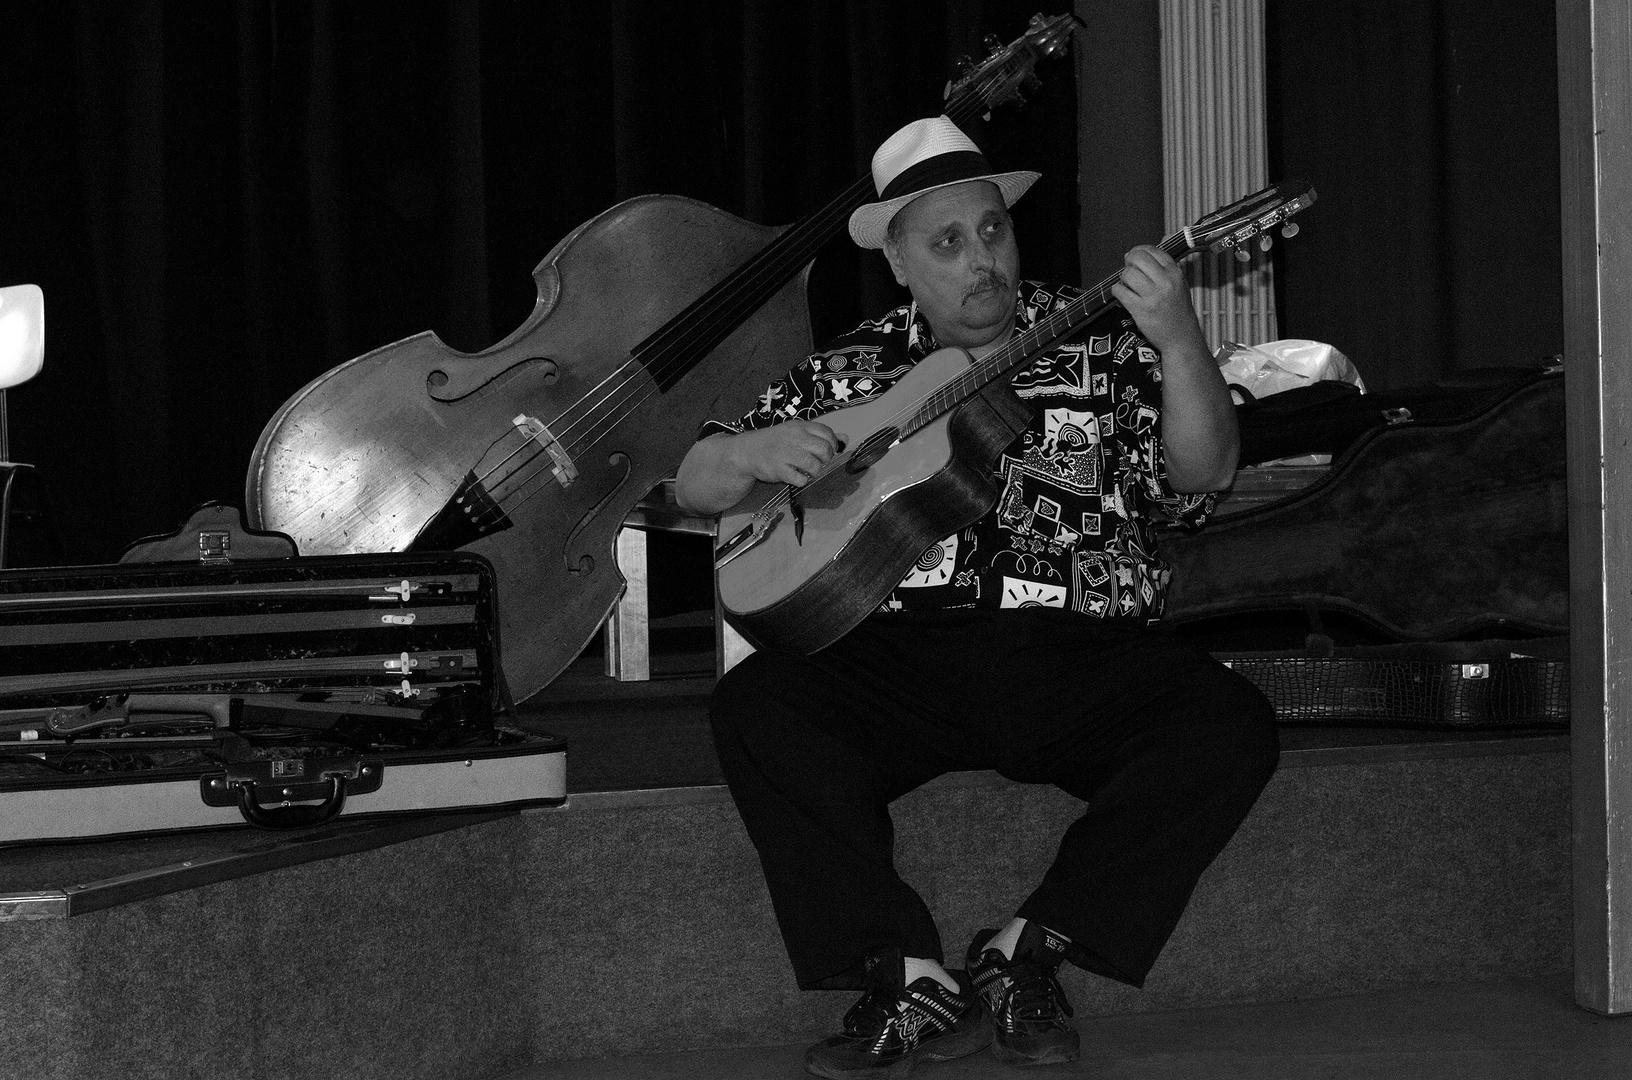 Gypsy Evening am 13.05.2011 im soundcafe - München